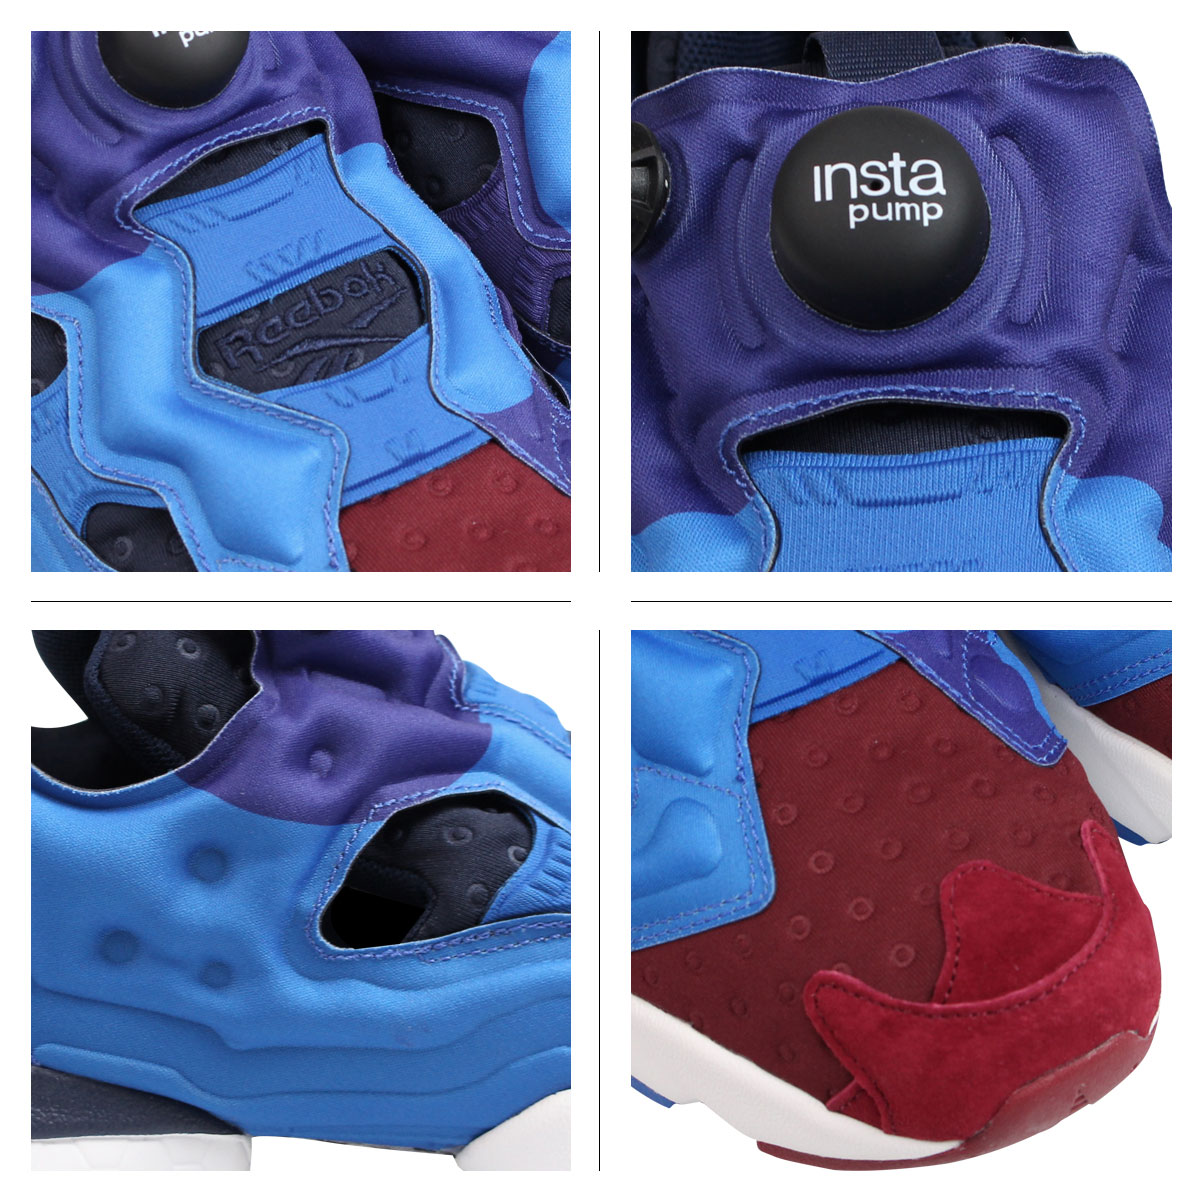 d39a0ca1ef0 Whats up Sports  Reebok Reebok pump fury sneakers INSTAPUMP FURY ...